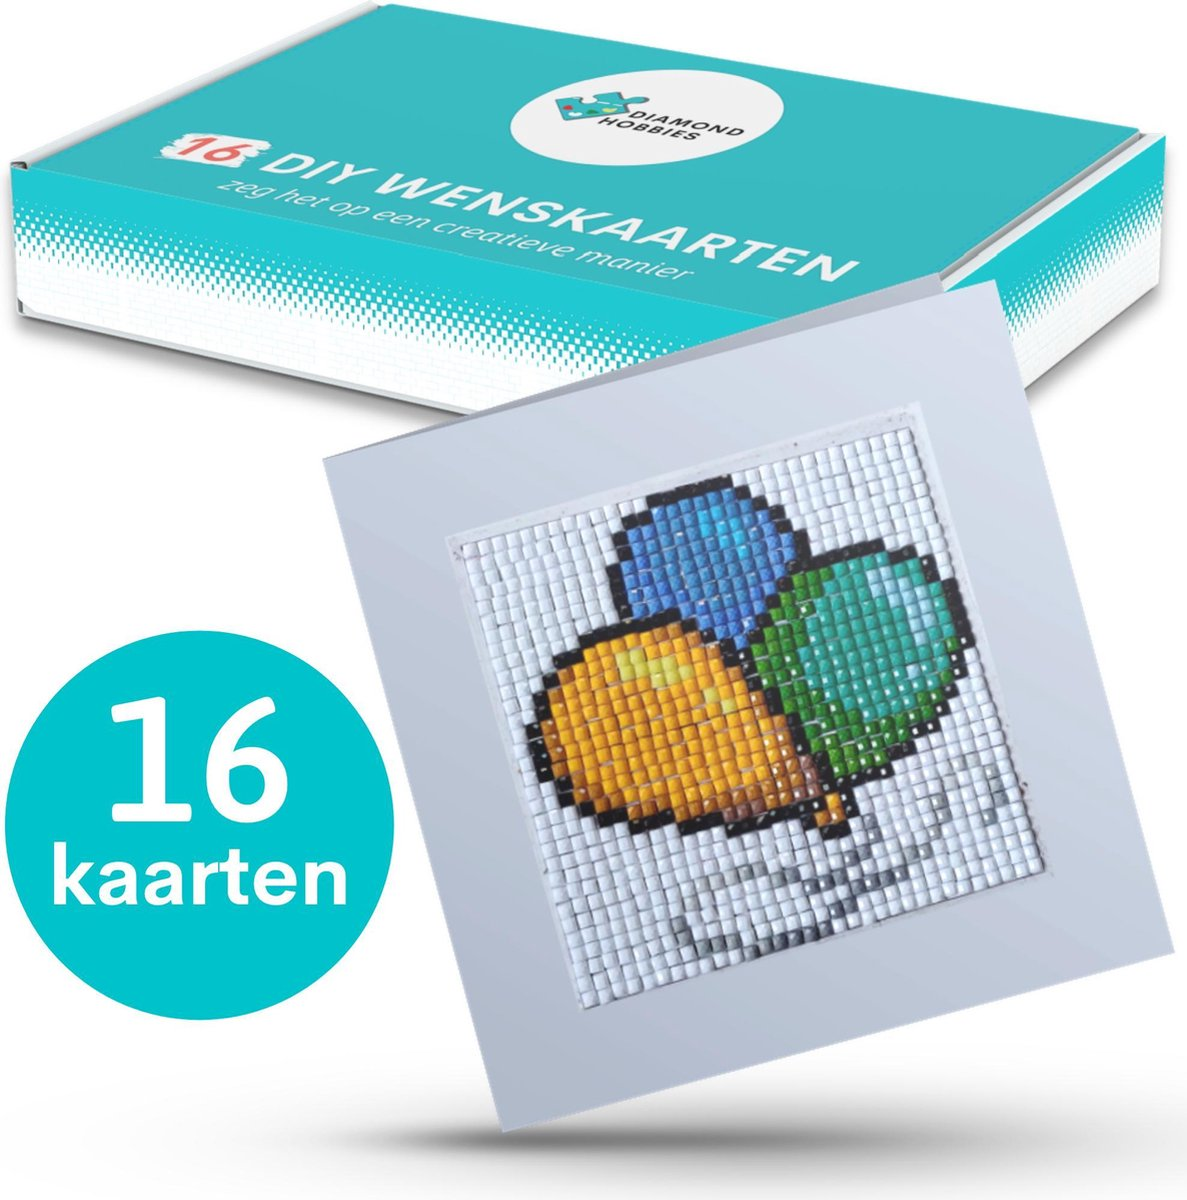 Diamond Painting Kaarten van Diamond Hobbies | 16 kaarten | 12x12cm | Verjaardagskaarten | Kerstkaarten | Diamond Painting Wenskaarten | Vaderdag kaart | Diamond Painting Kaartenset